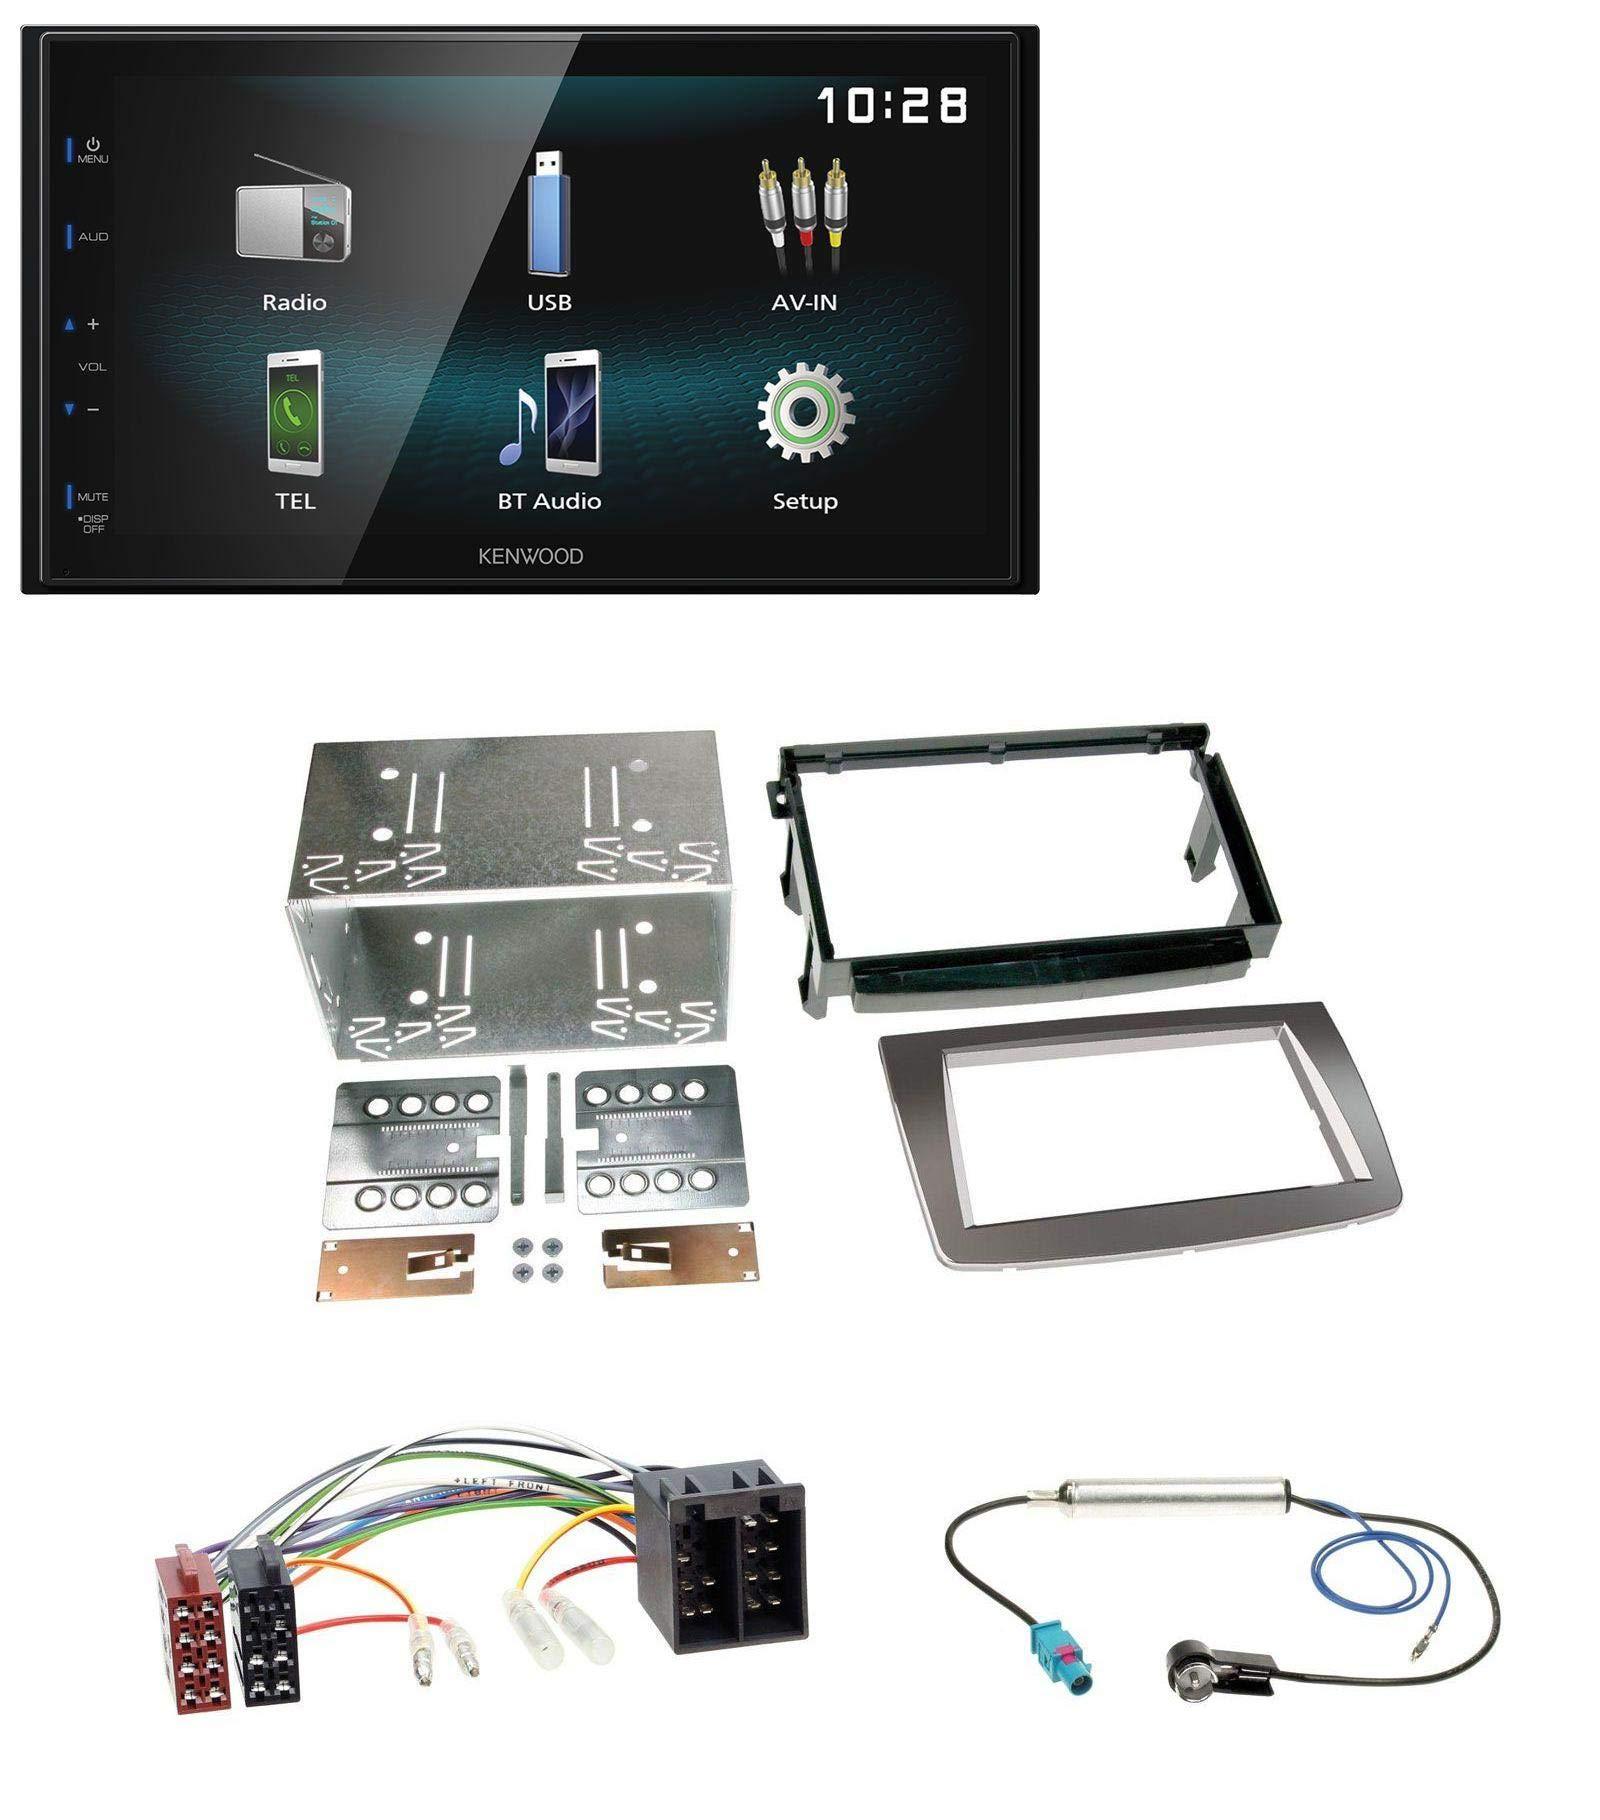 caraudio24-Kenwood-DMX120BT-AUX-Bluetooth-USB-MP3-2DIN-Autoradio-fr-Alfa-Romeo-Mito-ISO-955-08-14-Silber